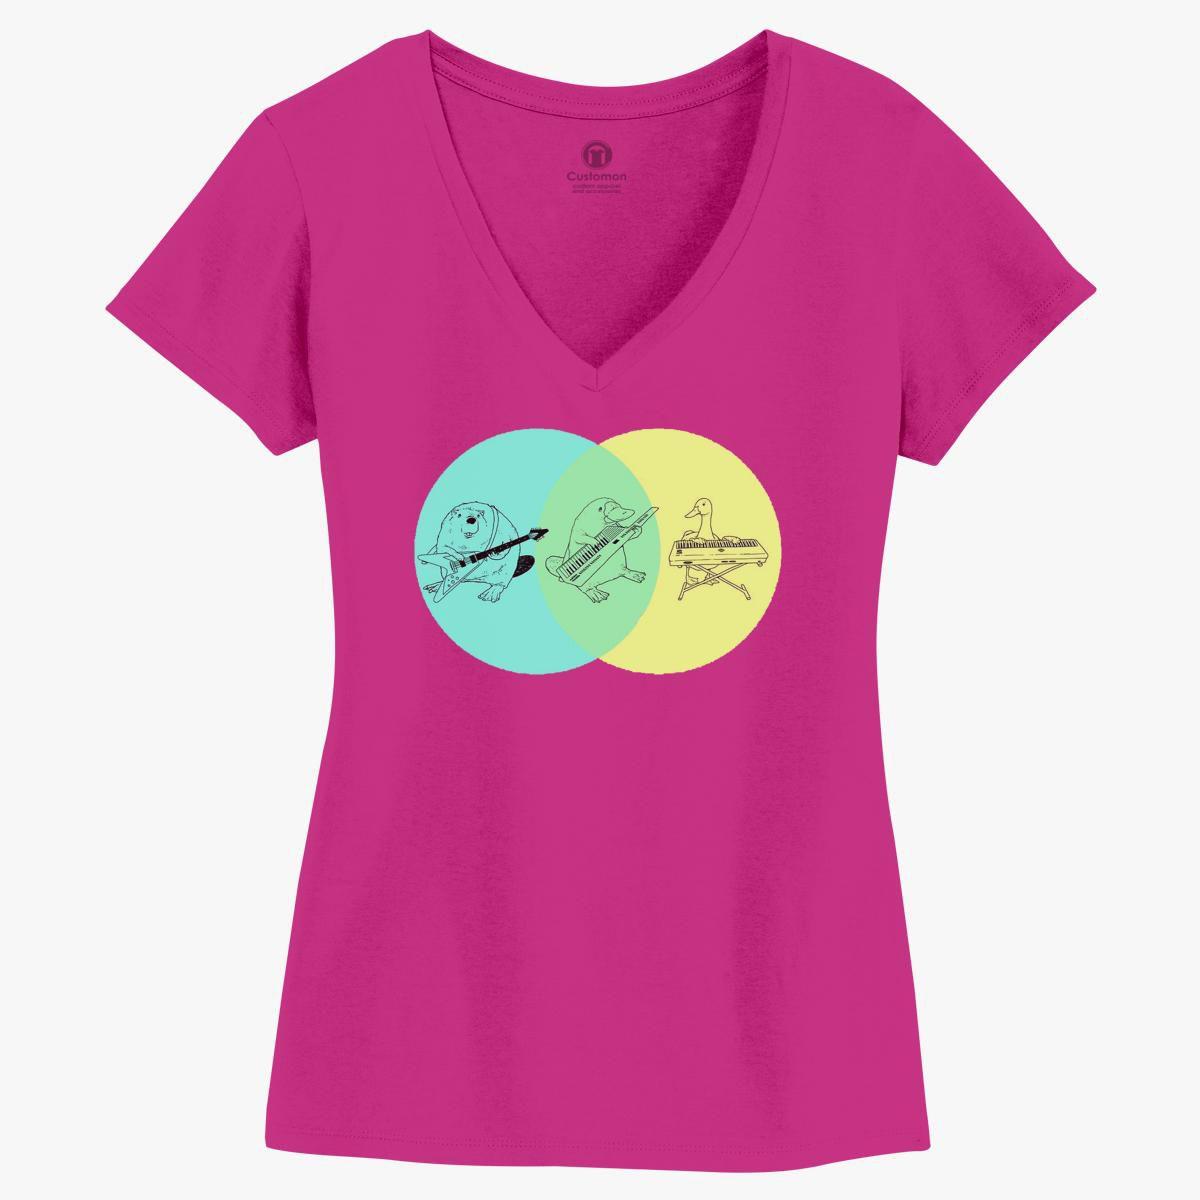 keytar platypus venn diagram women u0026 39 s v-neck t-shirt